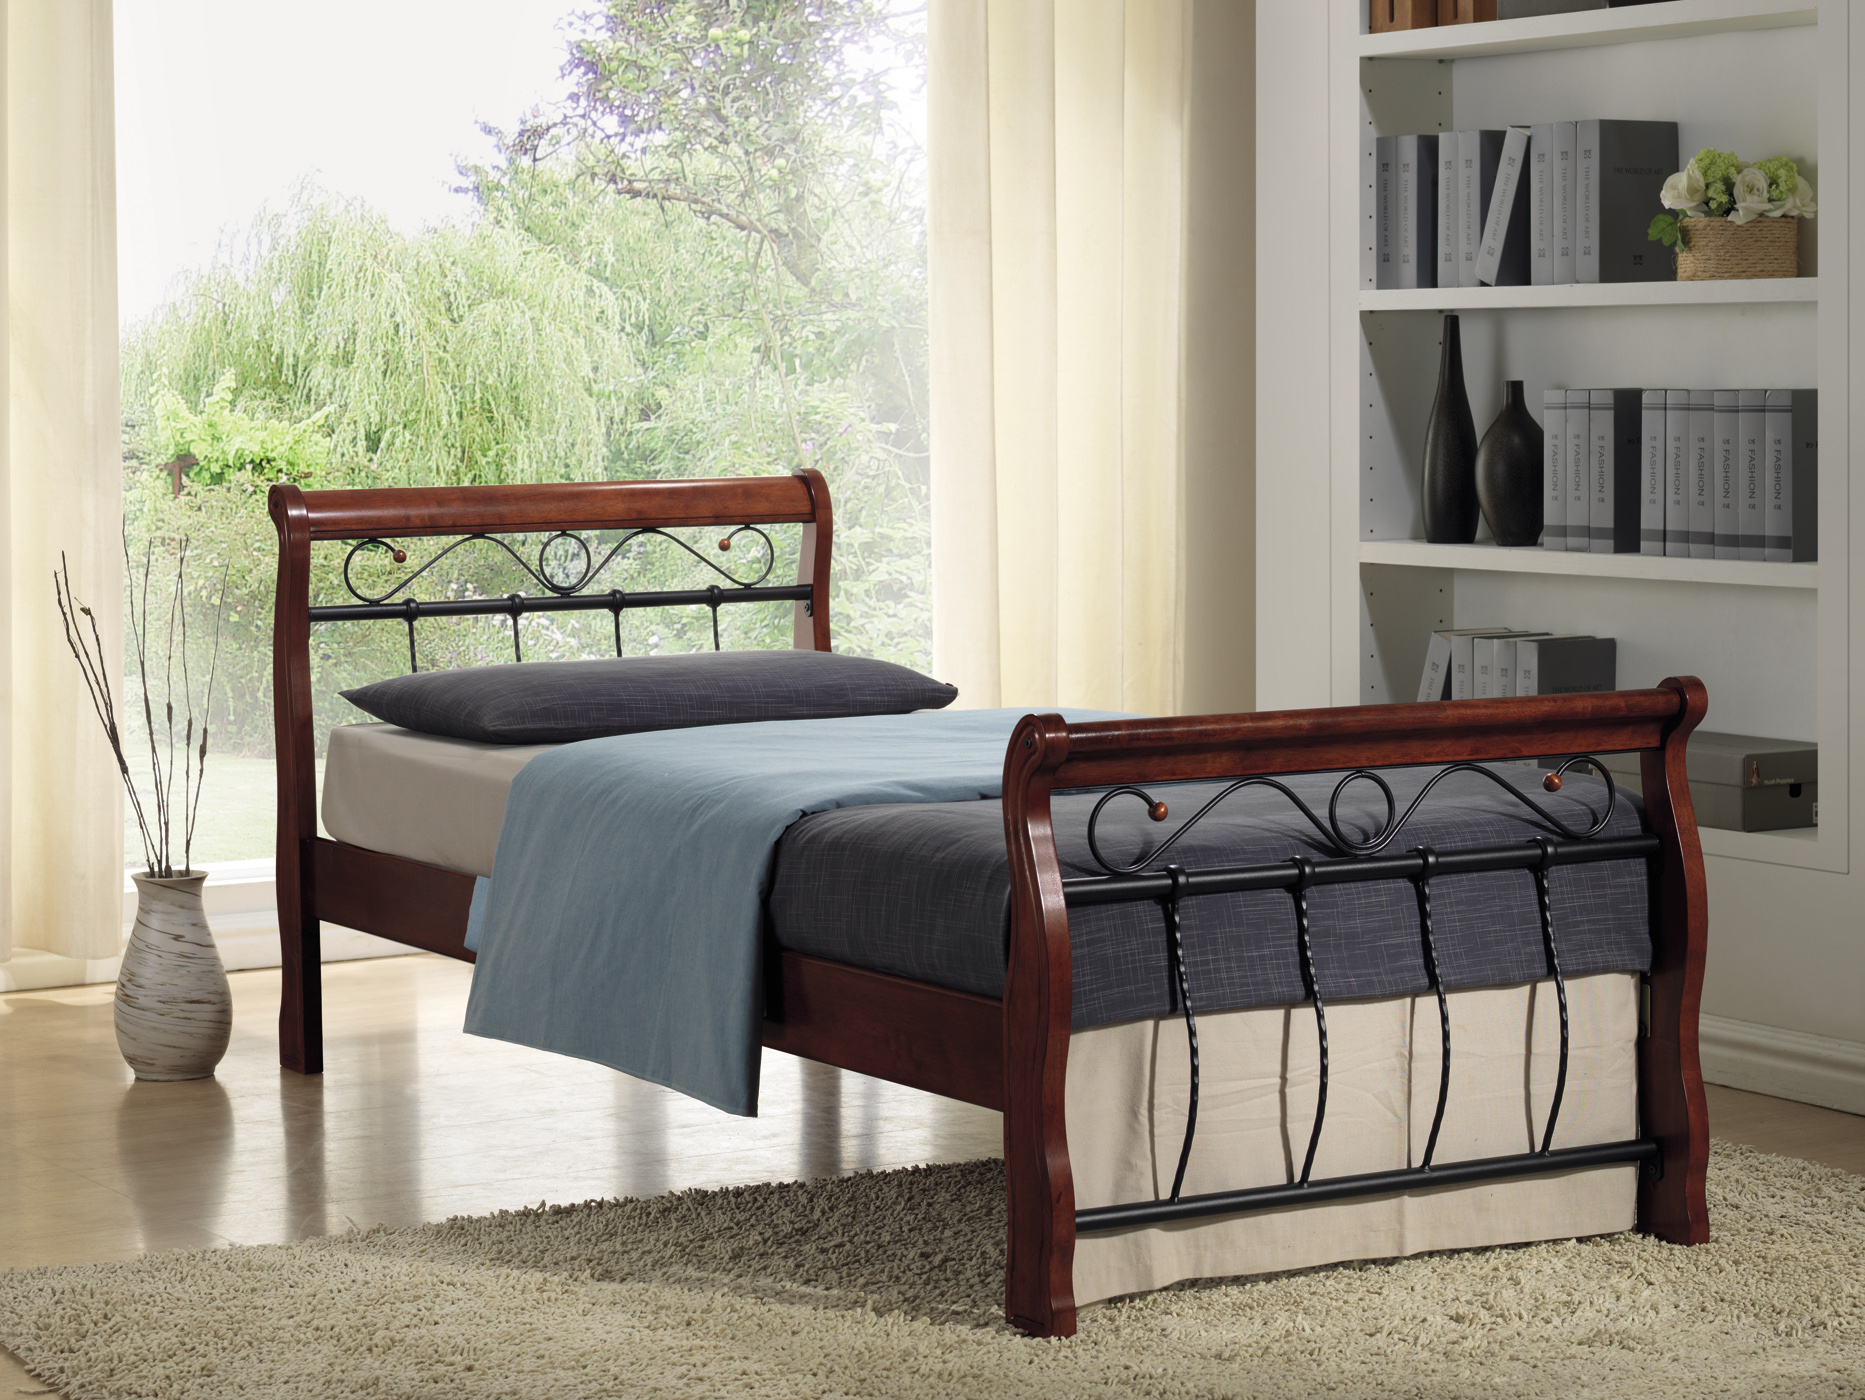 Jednolůžková postel 120 cm - Signal - Venecja (s roštem)